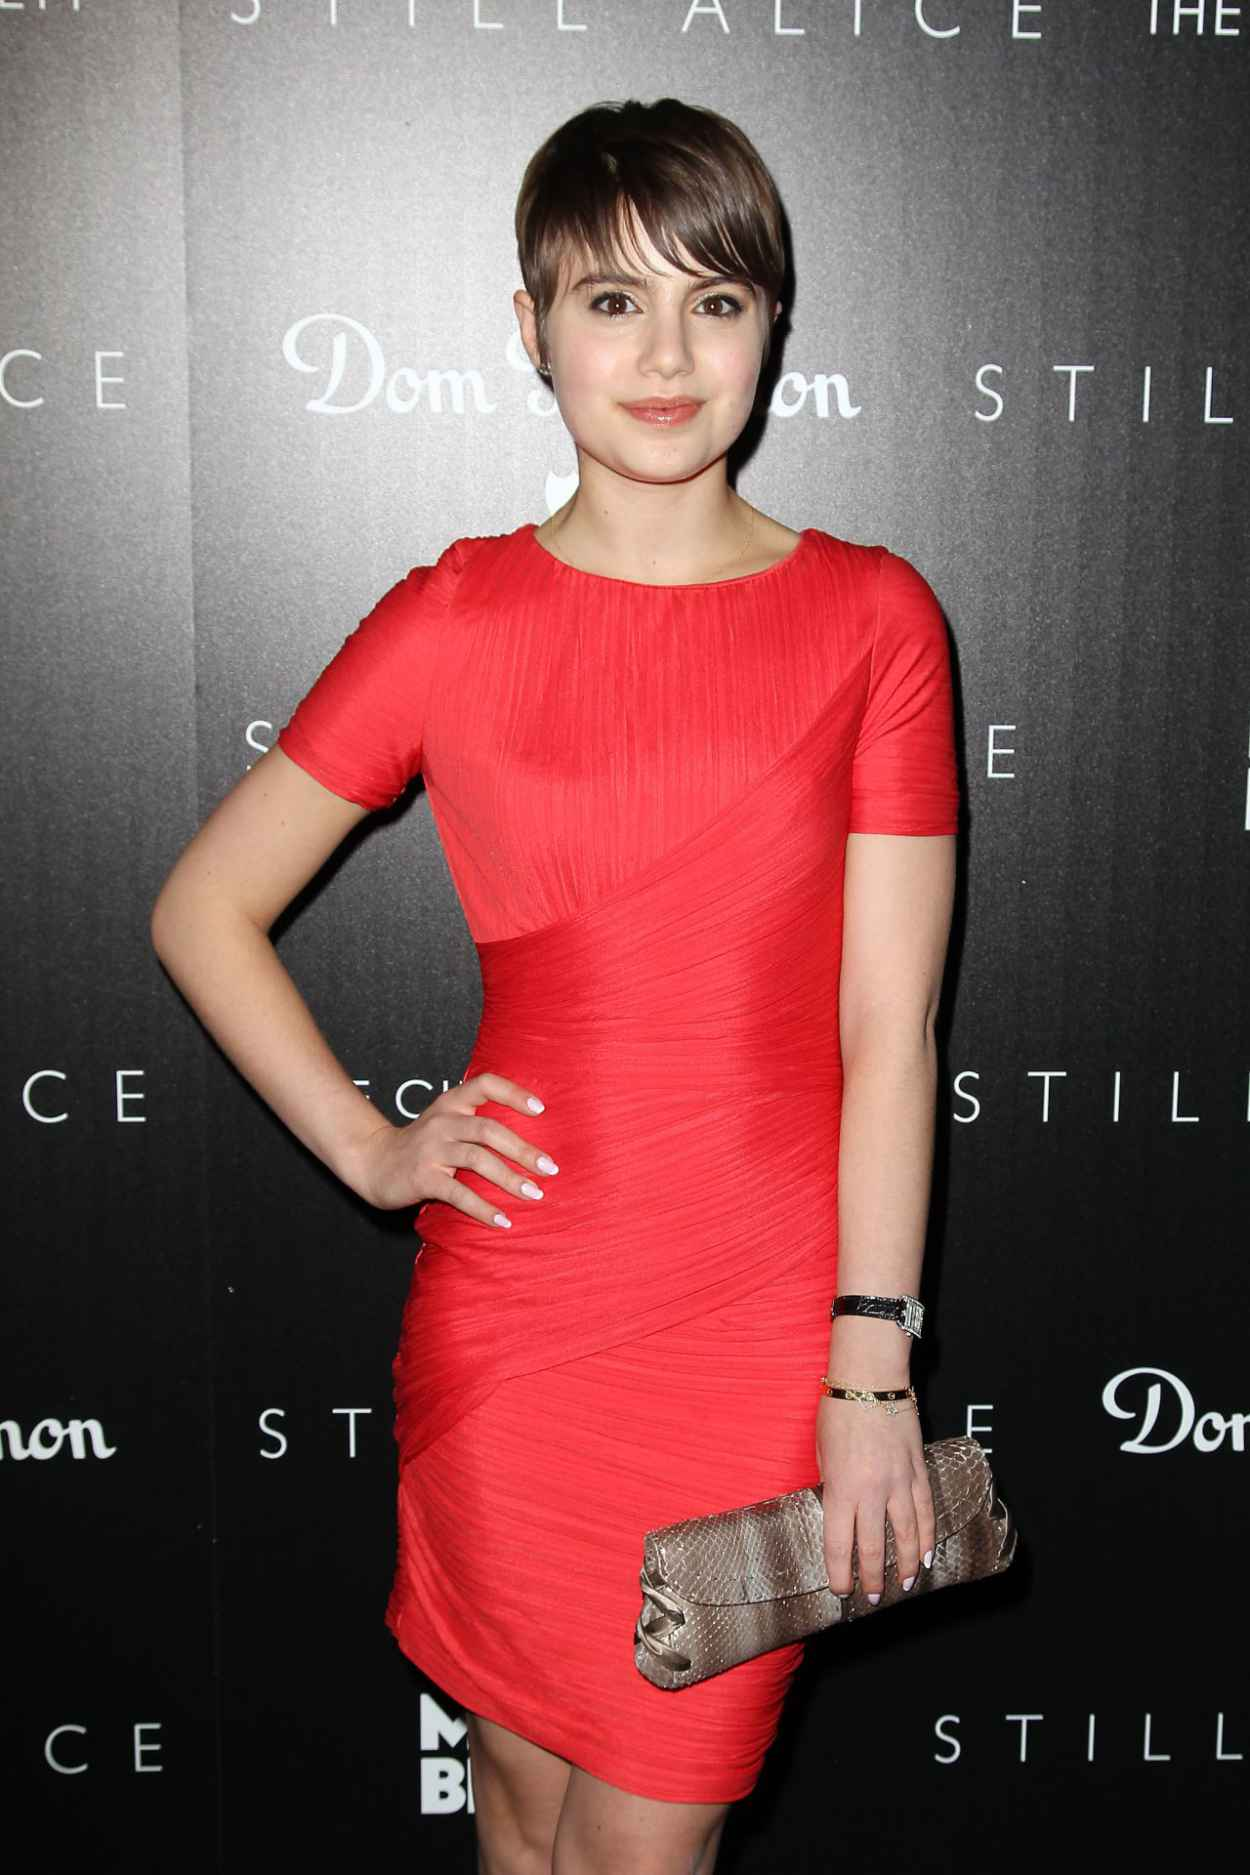 Sami Gayle in Red Dress - Still Alice Screening in New York City-1